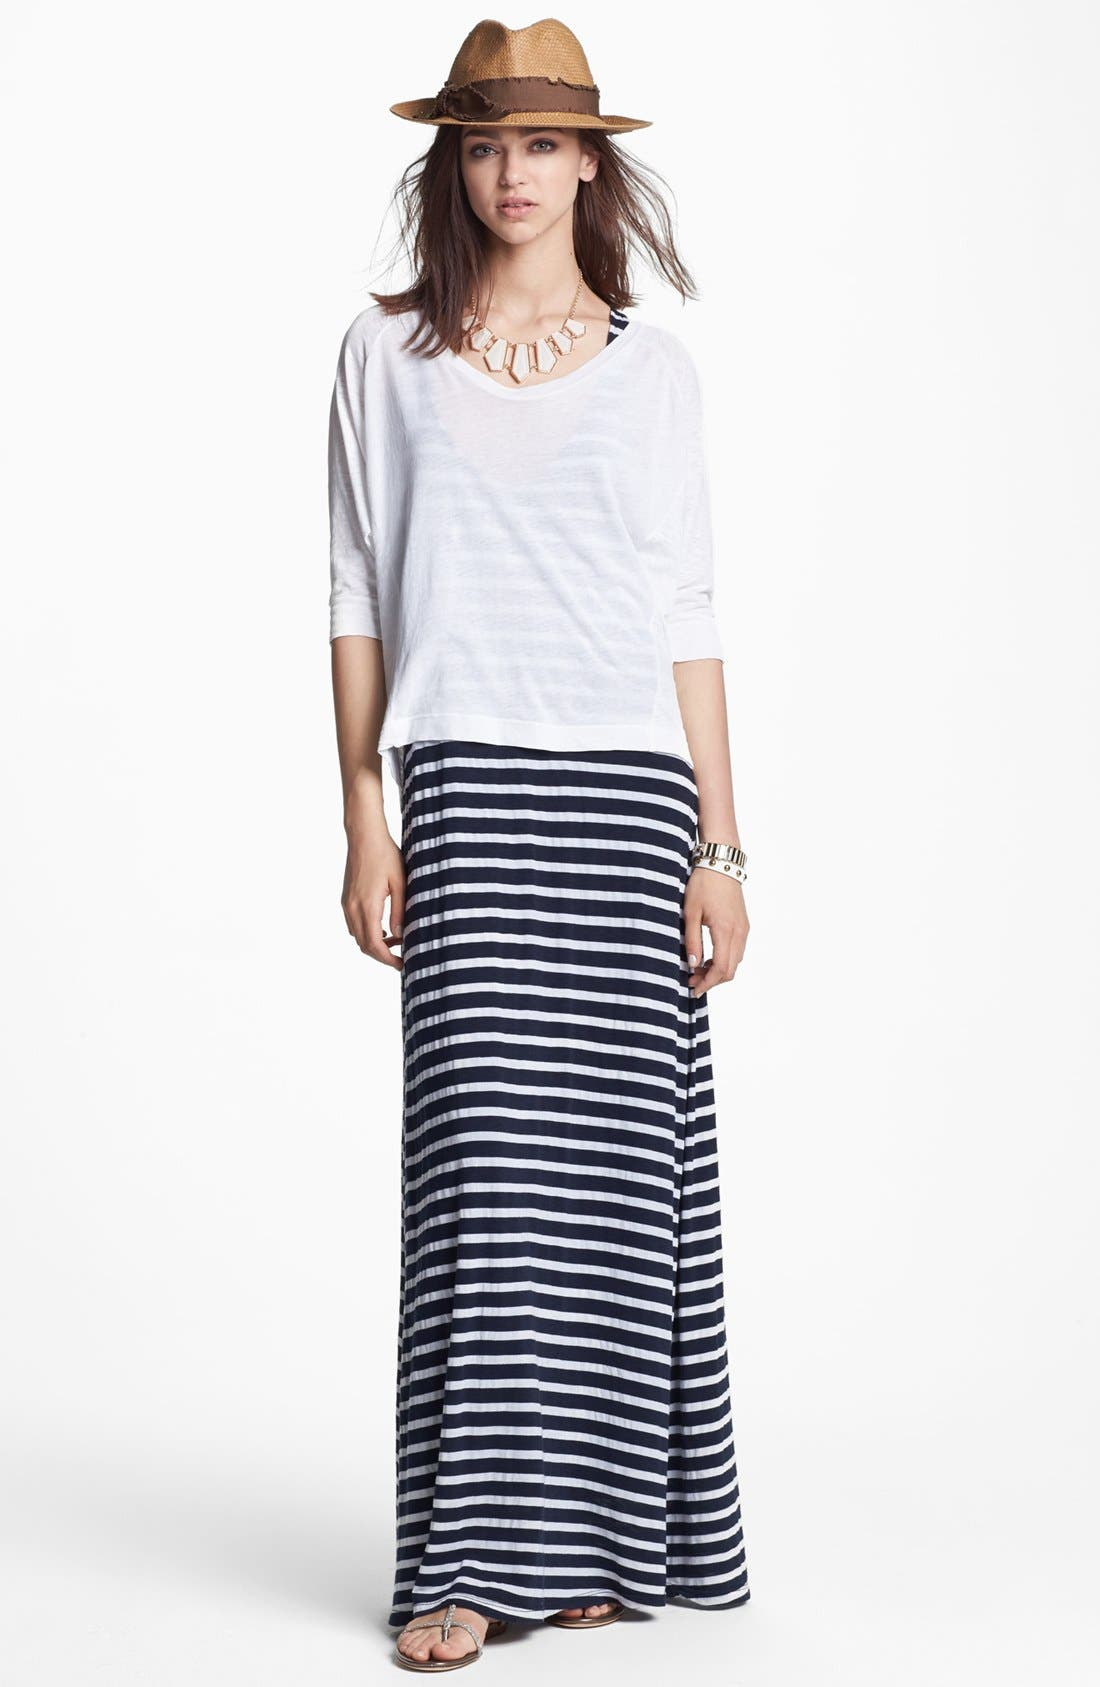 Alternate Image 1 Selected - Splendid Tee & Maxi Dress